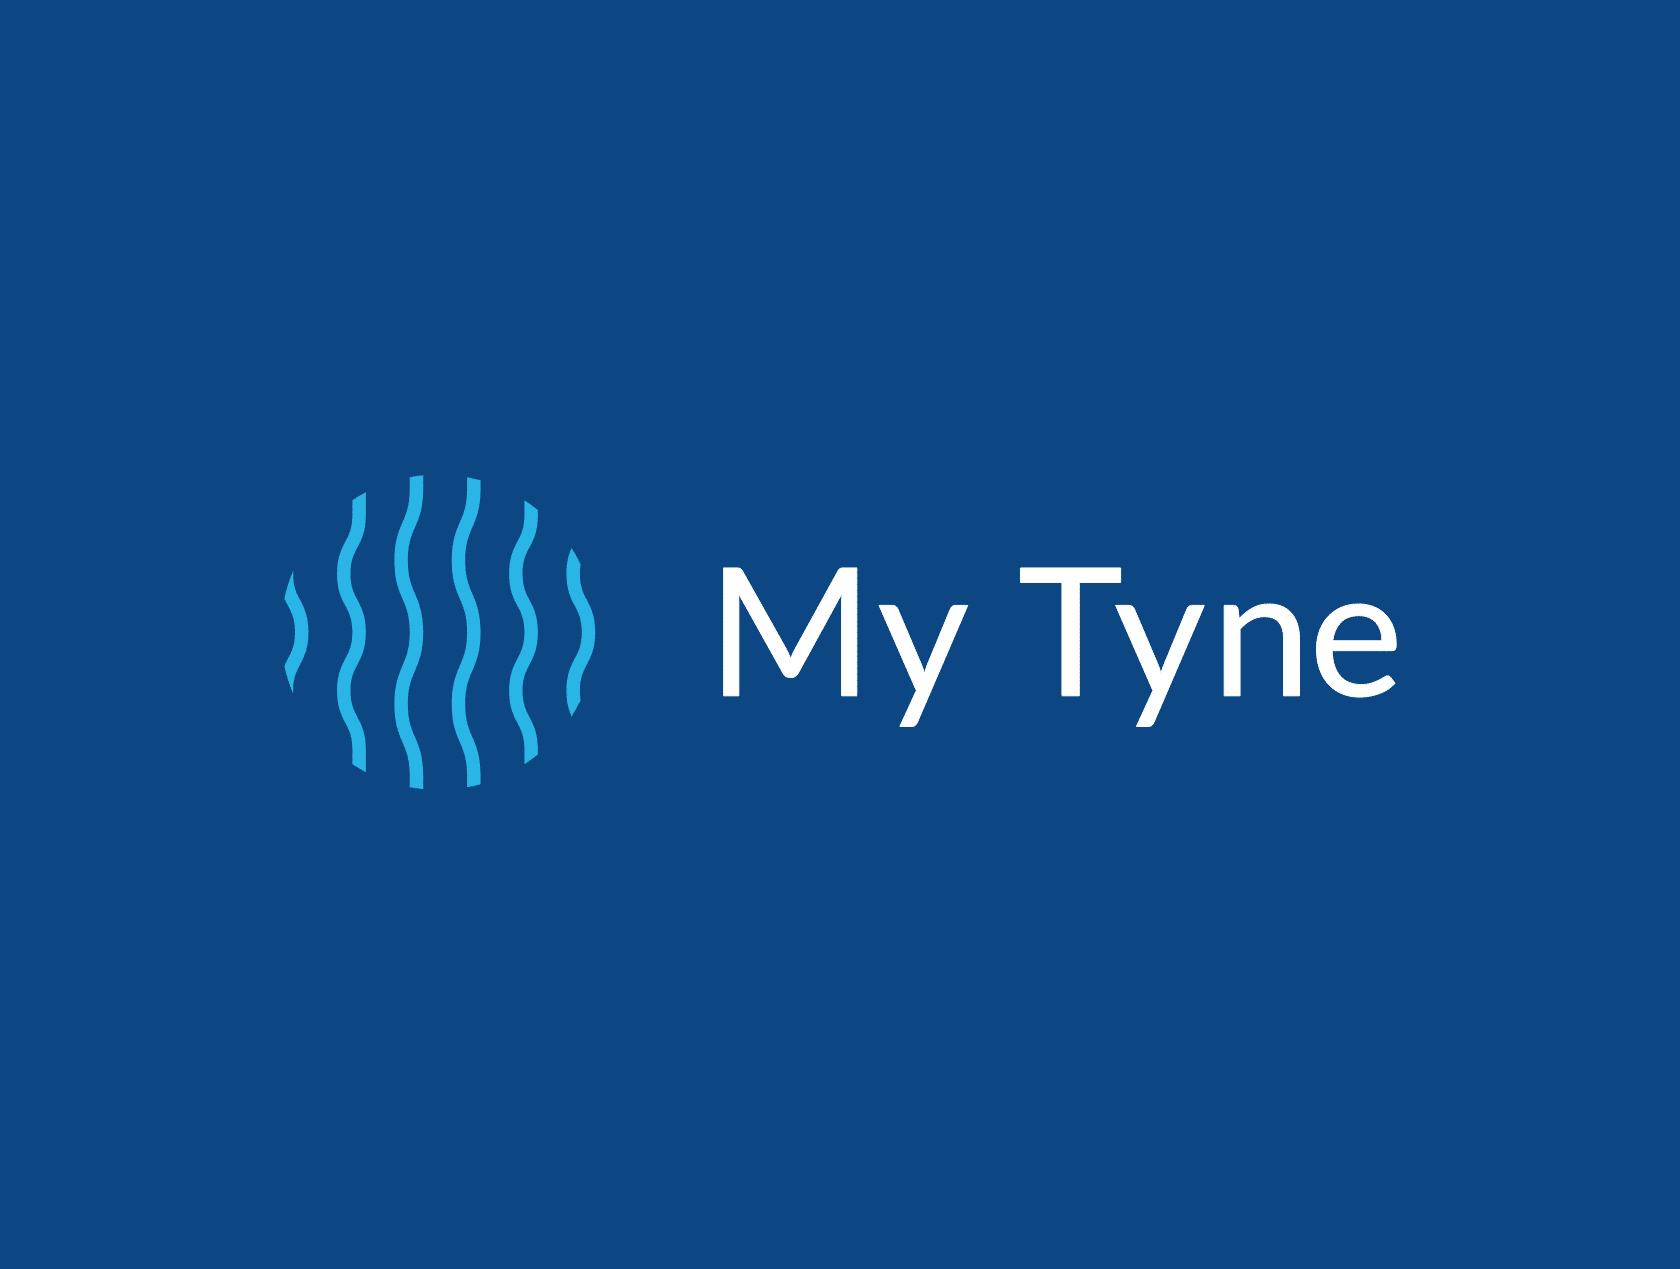 Logo design for MyTyne